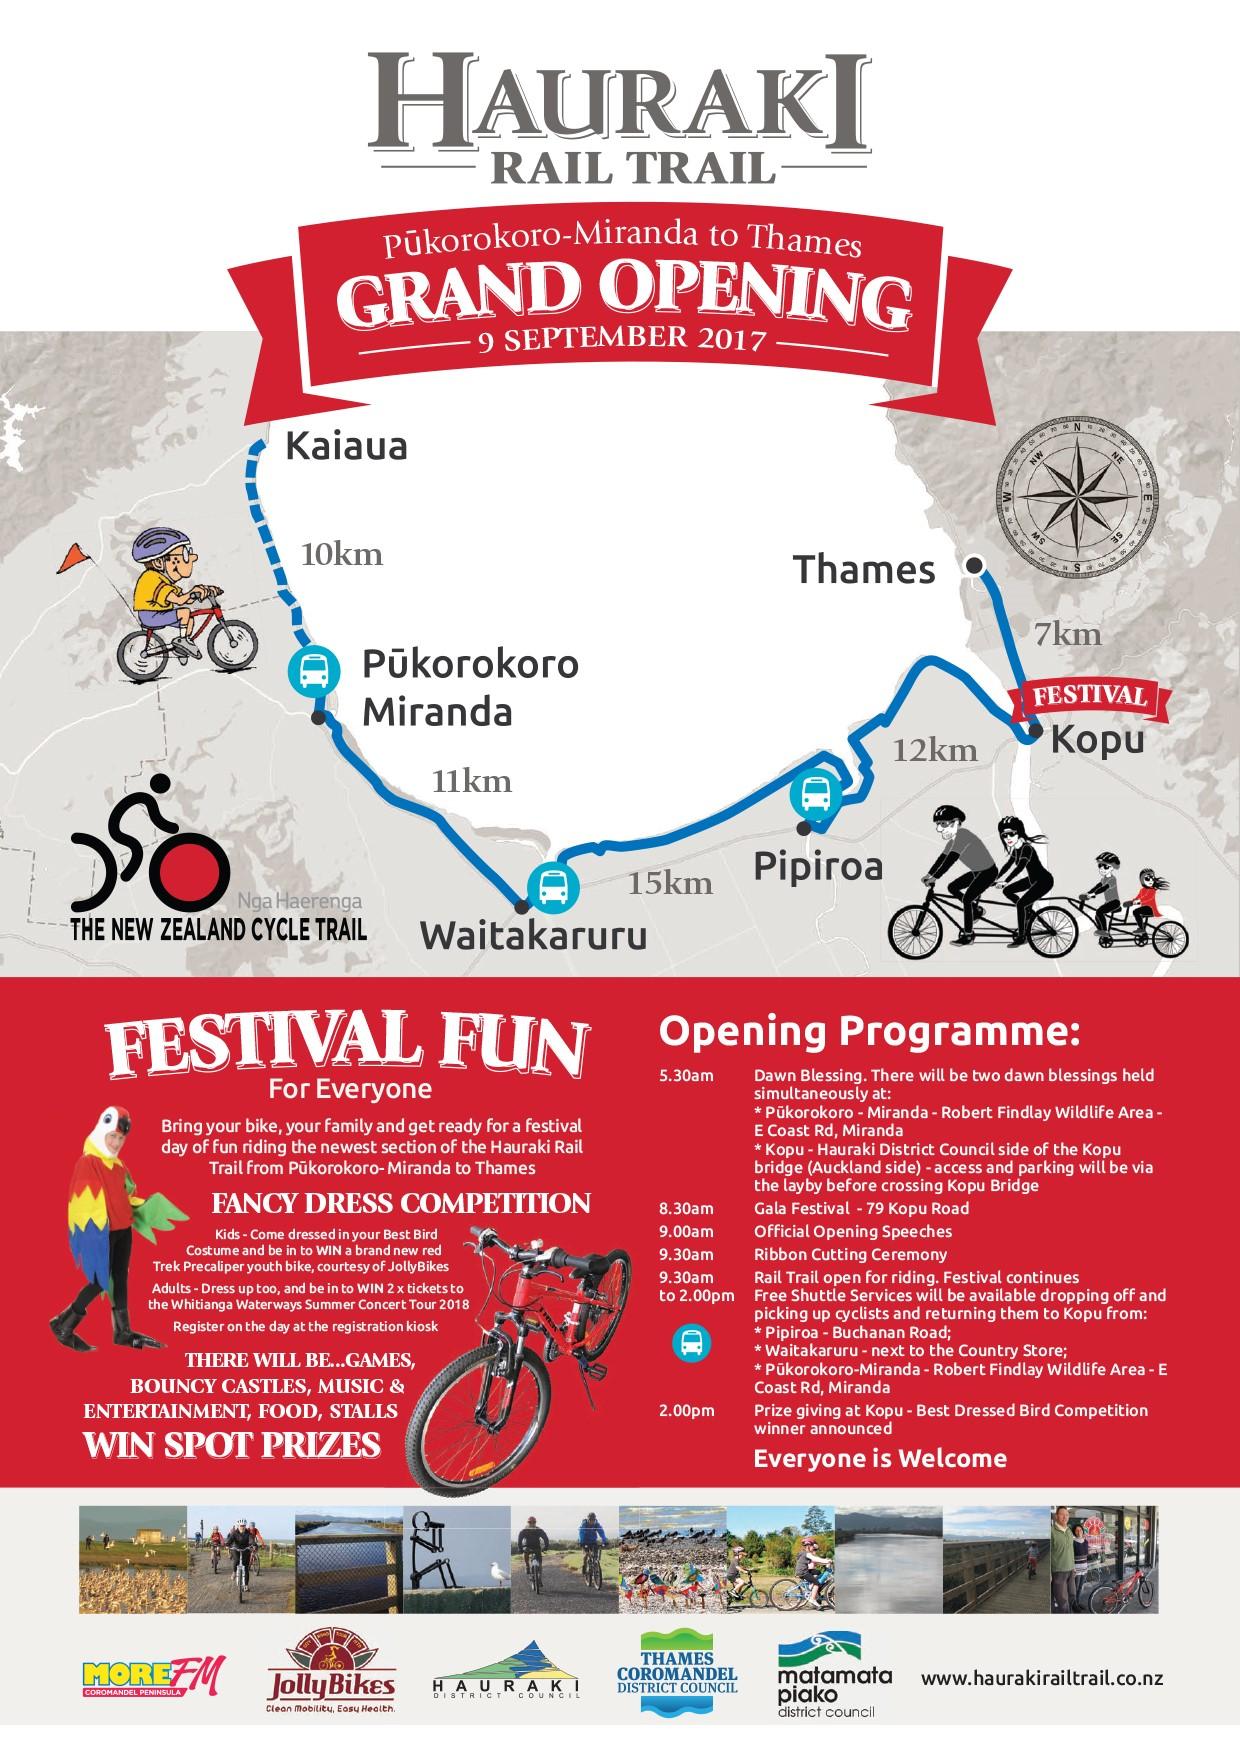 Hauraki Rail Trail Grand Opening